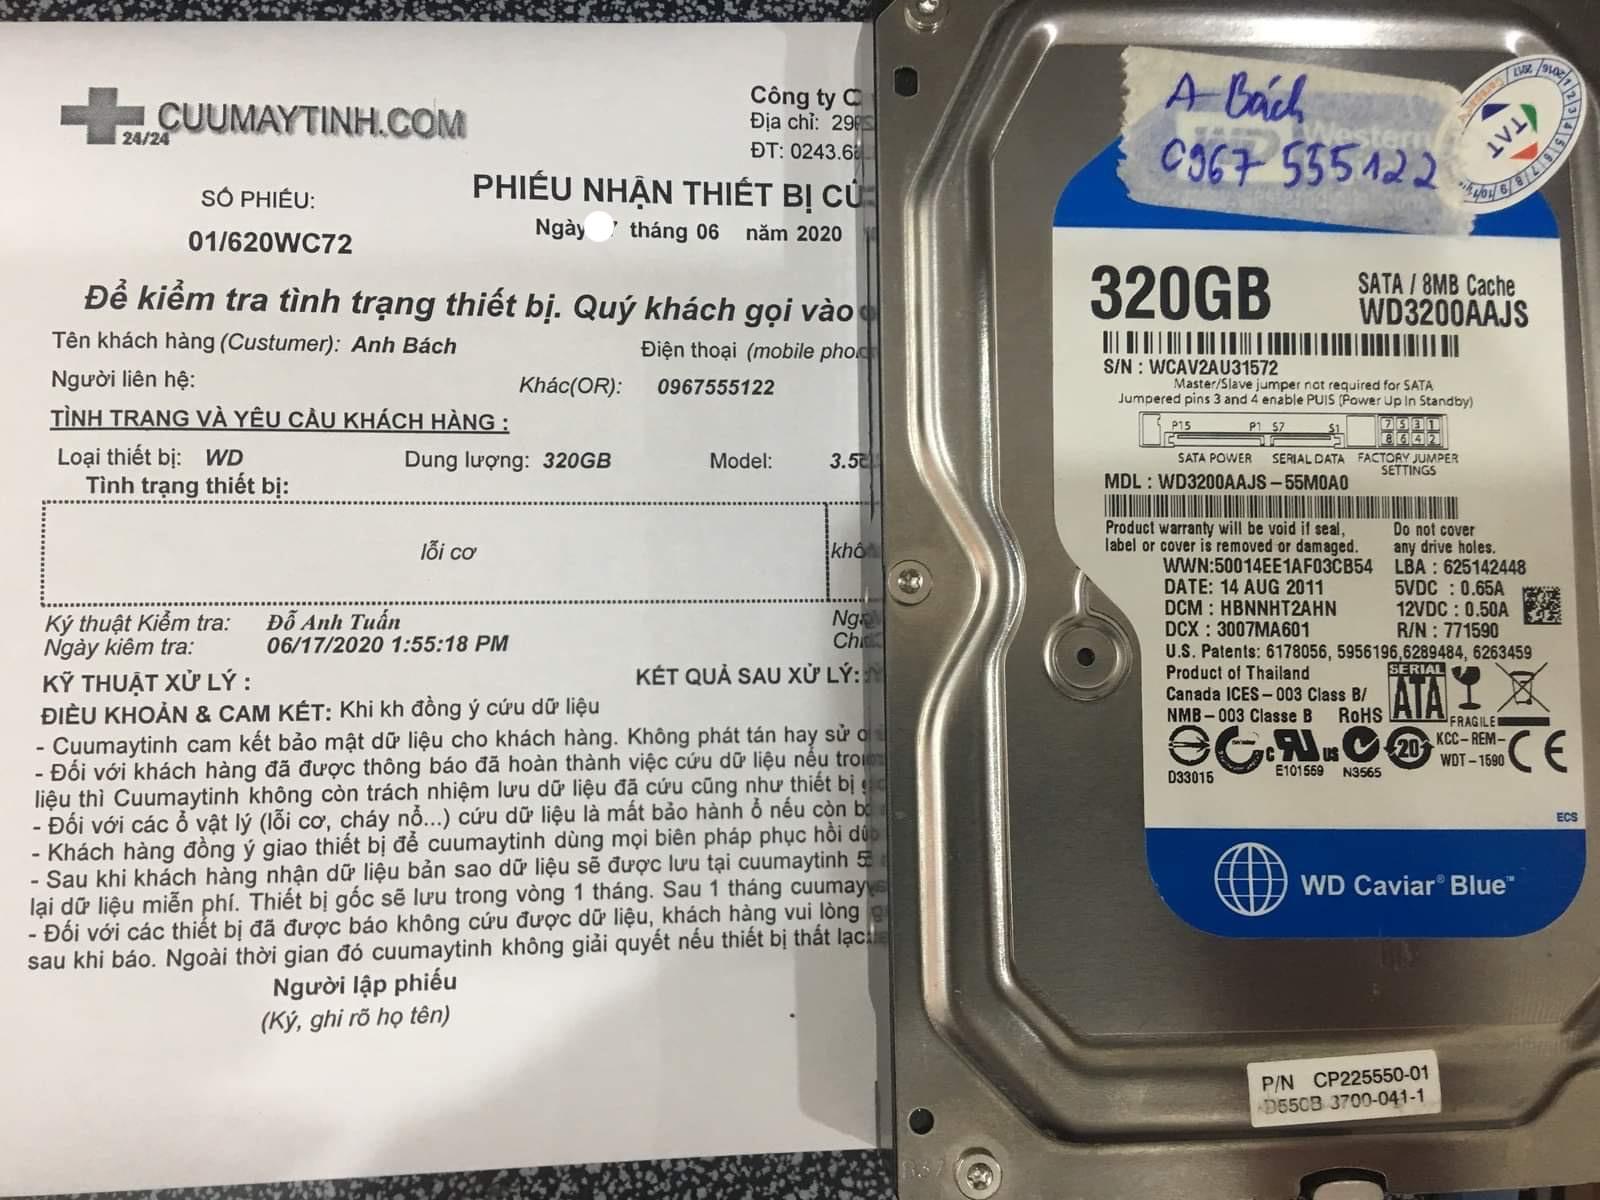 Cứu dữ liệu ổ cứng Western 320GB lỗi cơ 20/06/2020 - cuumaytinh